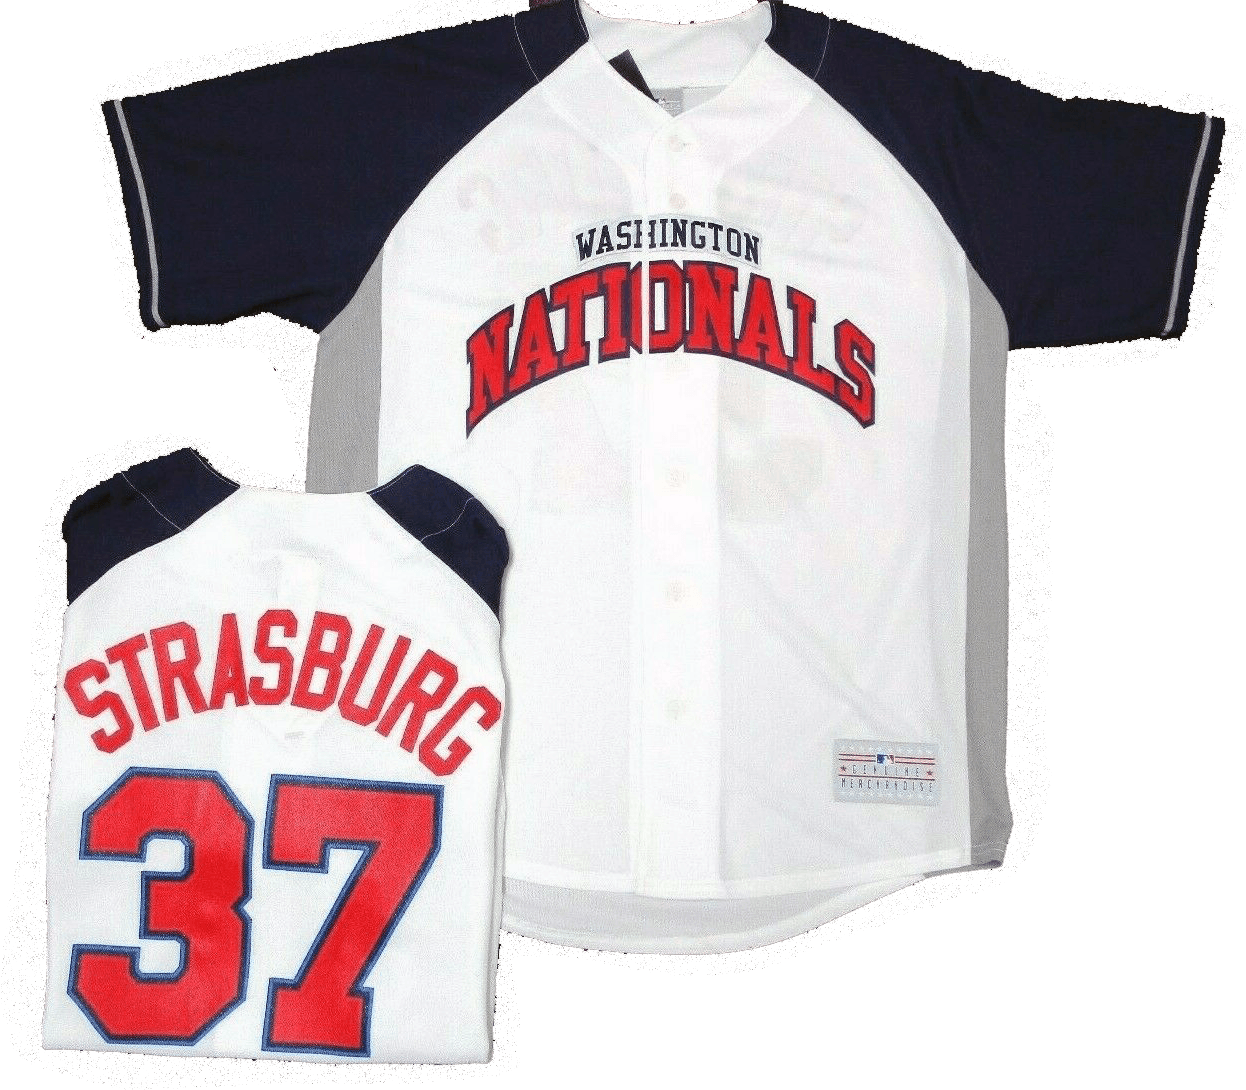 Strasburg 37 Washington Nationals